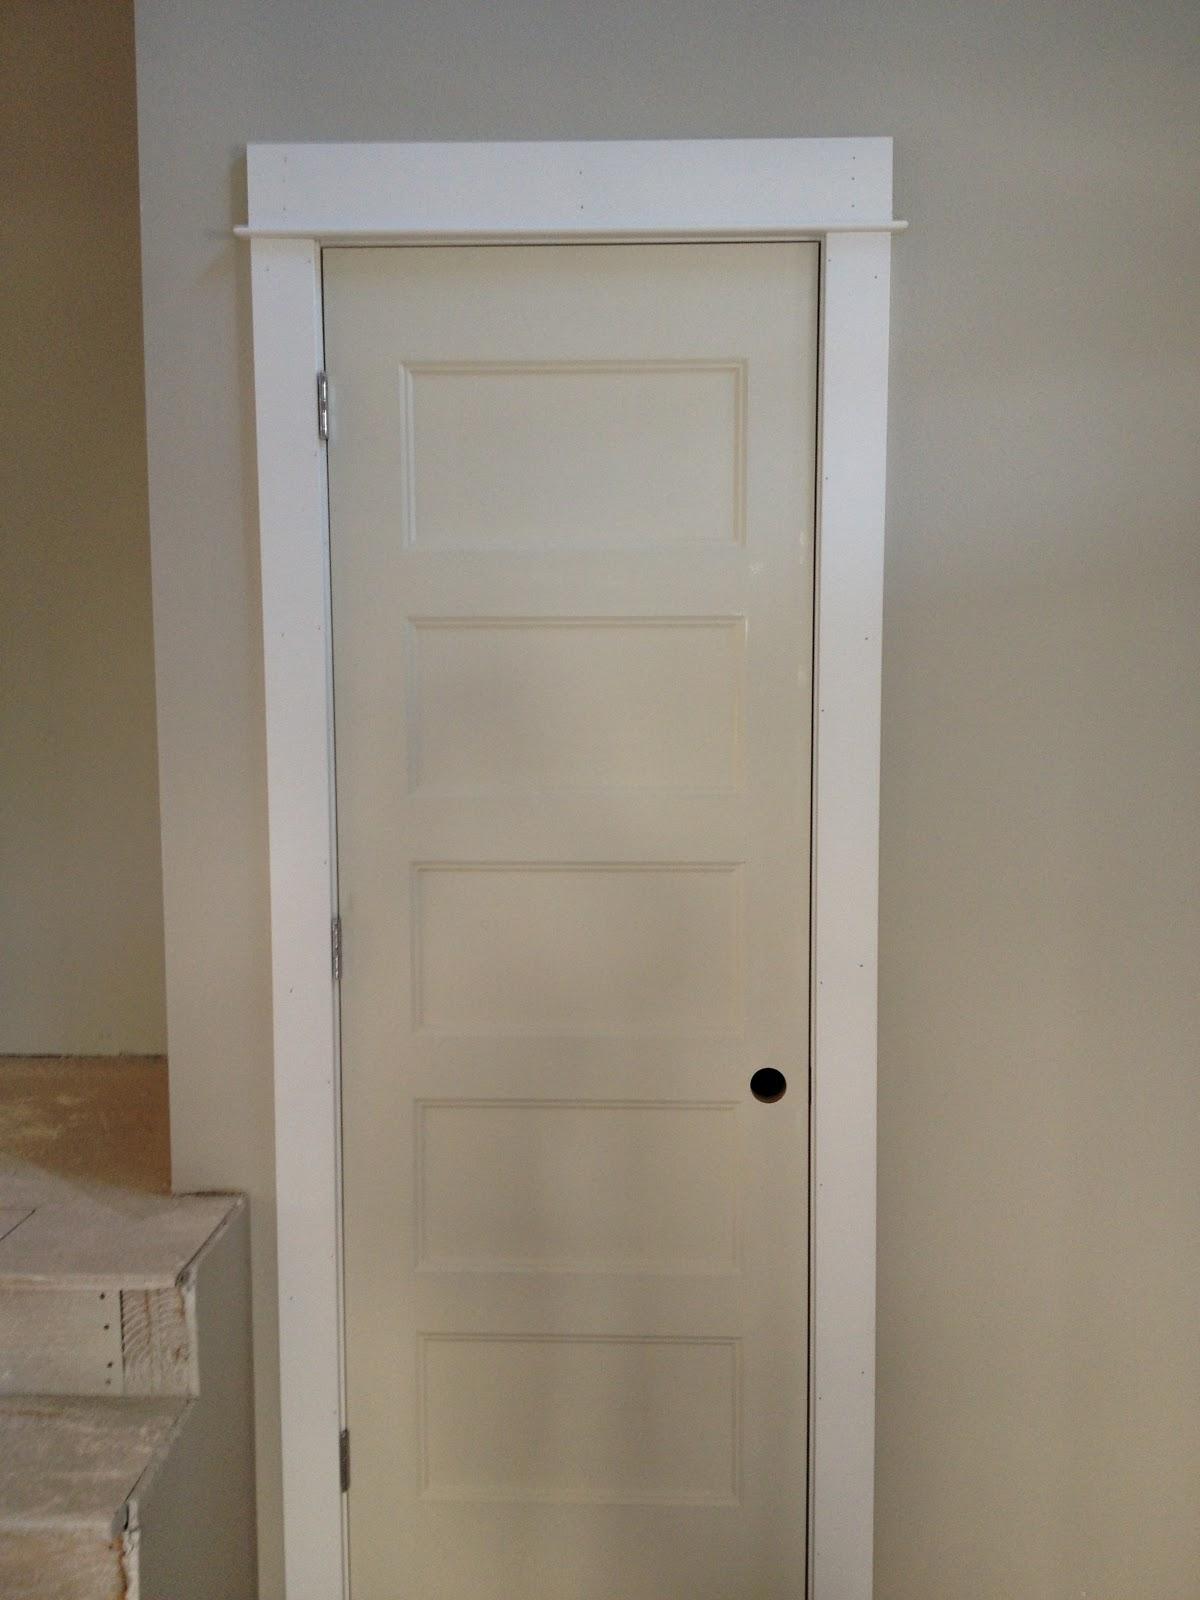 5 Panel Interior Doors Horizontal